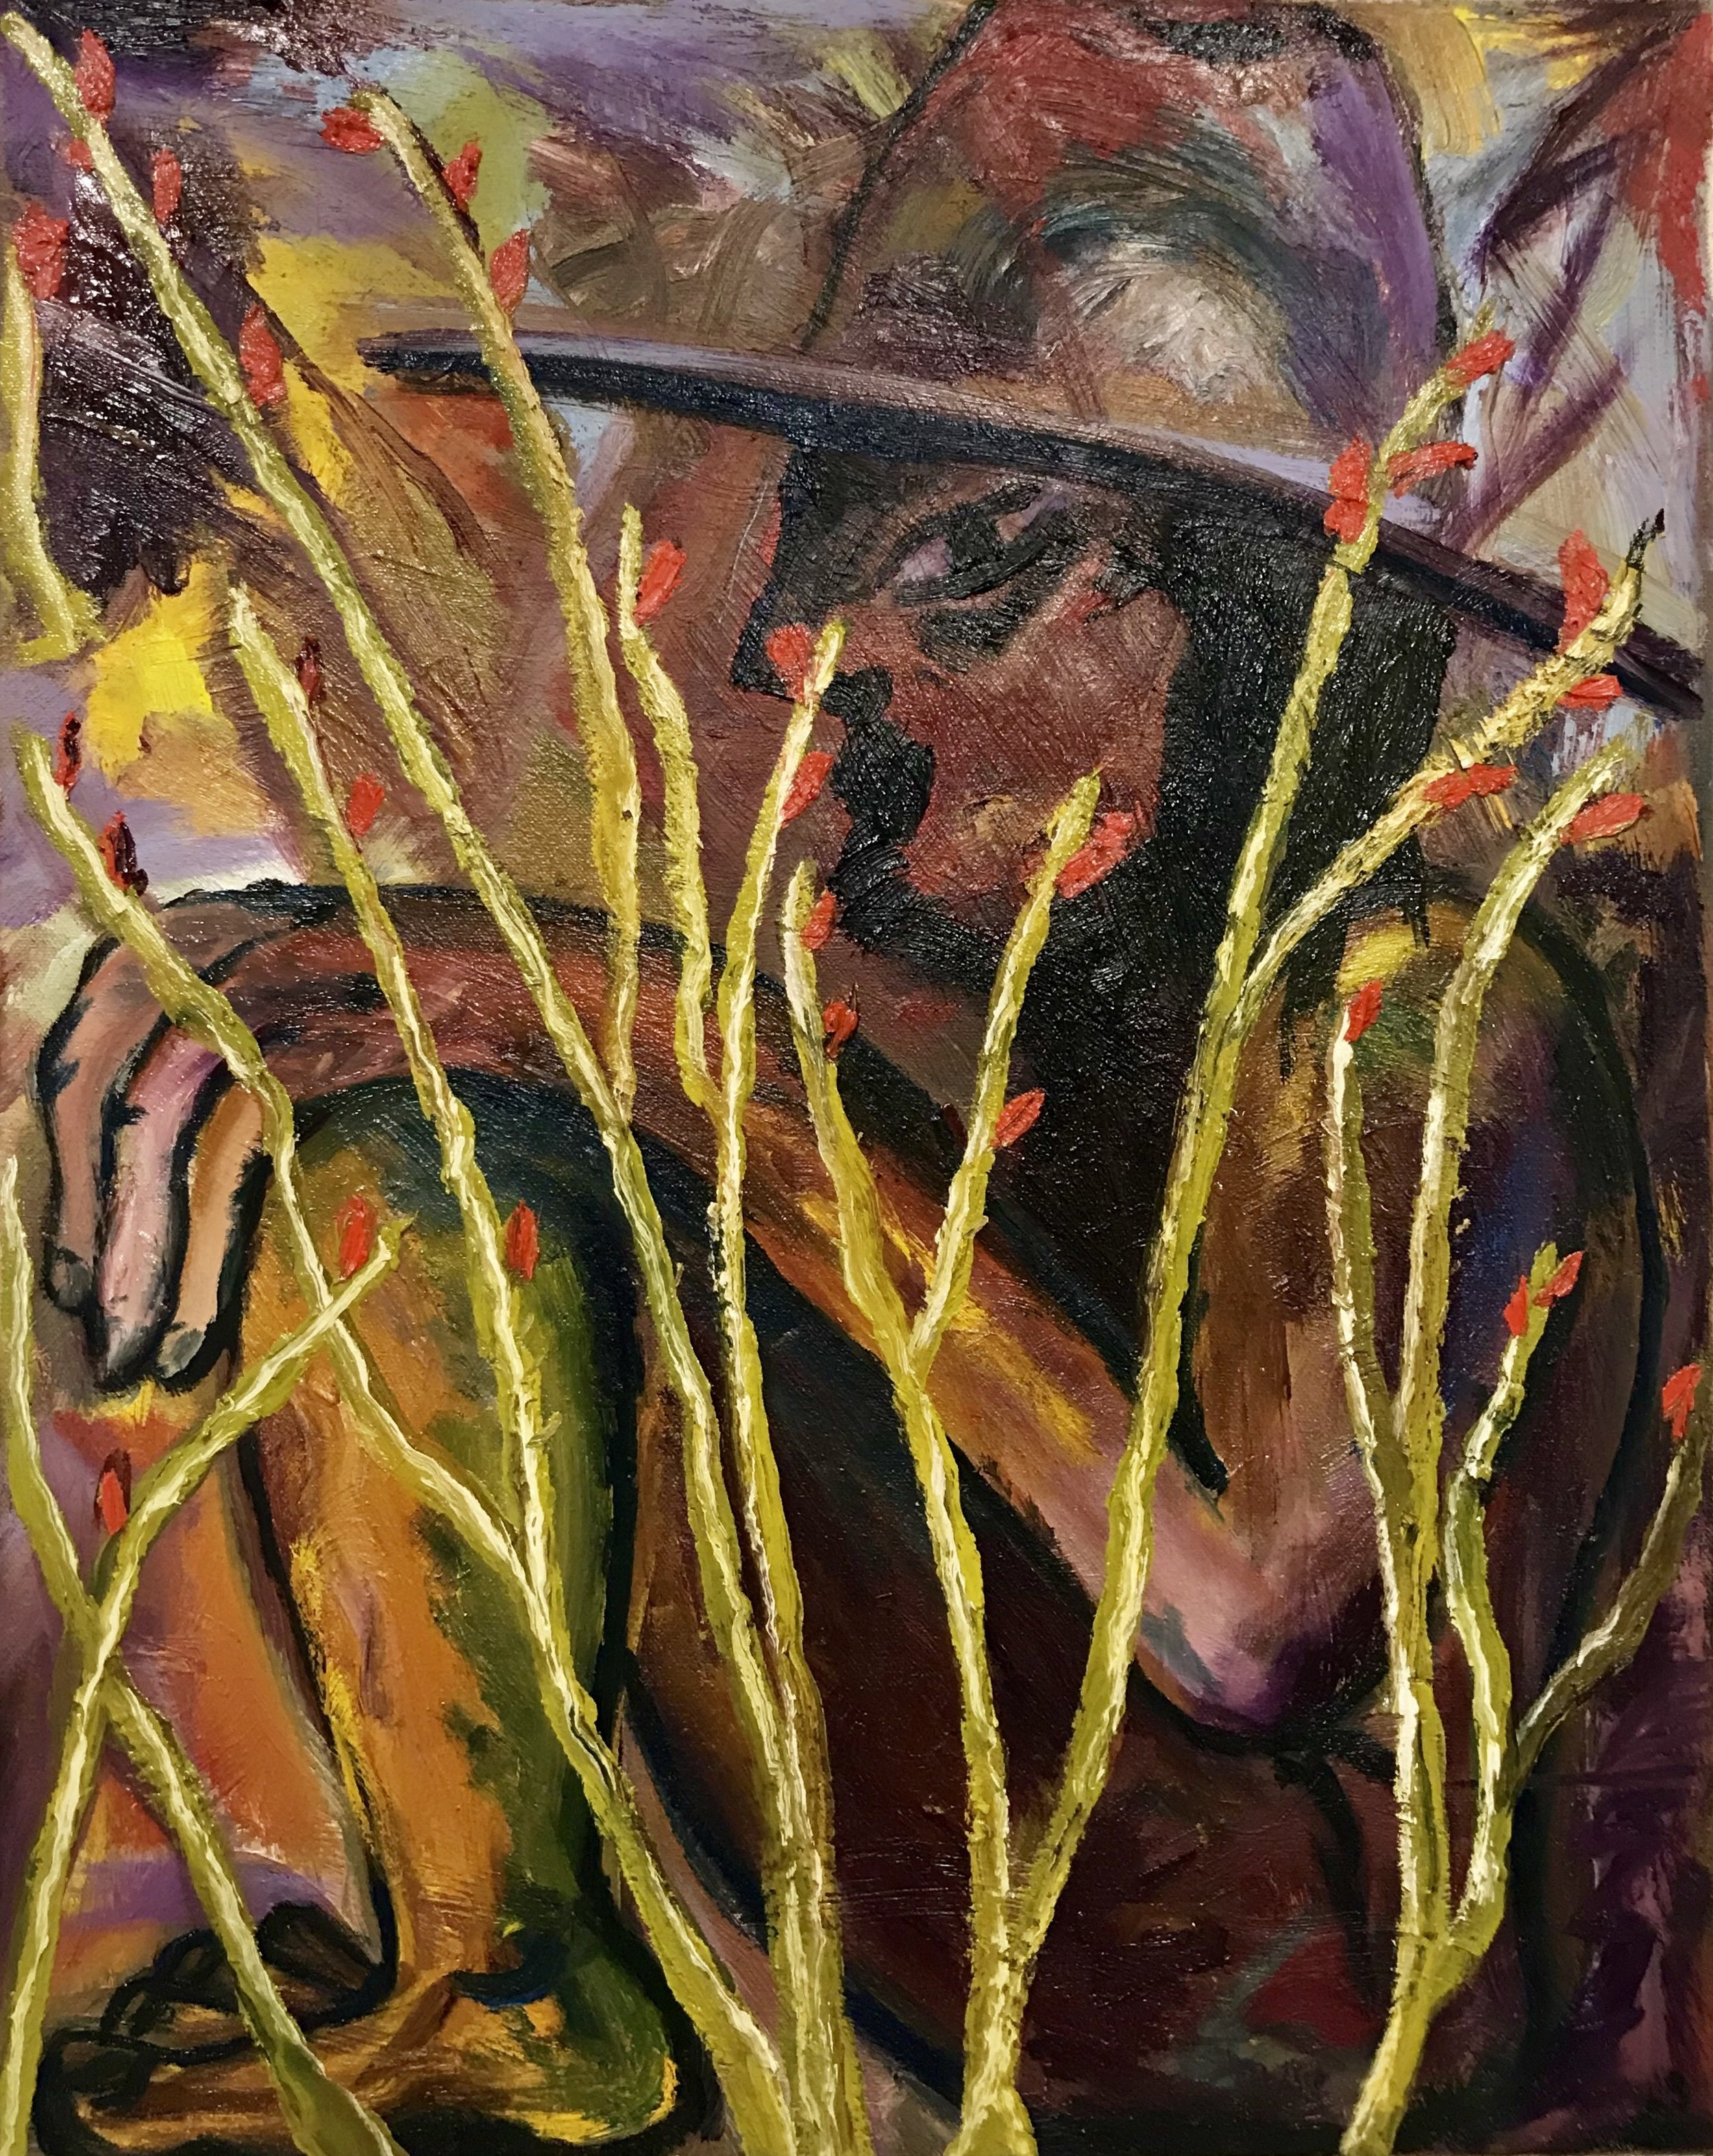 Daniel Gibson  Hiding in Ocotillo ,2017 oil on canvas 18 x 16 in.